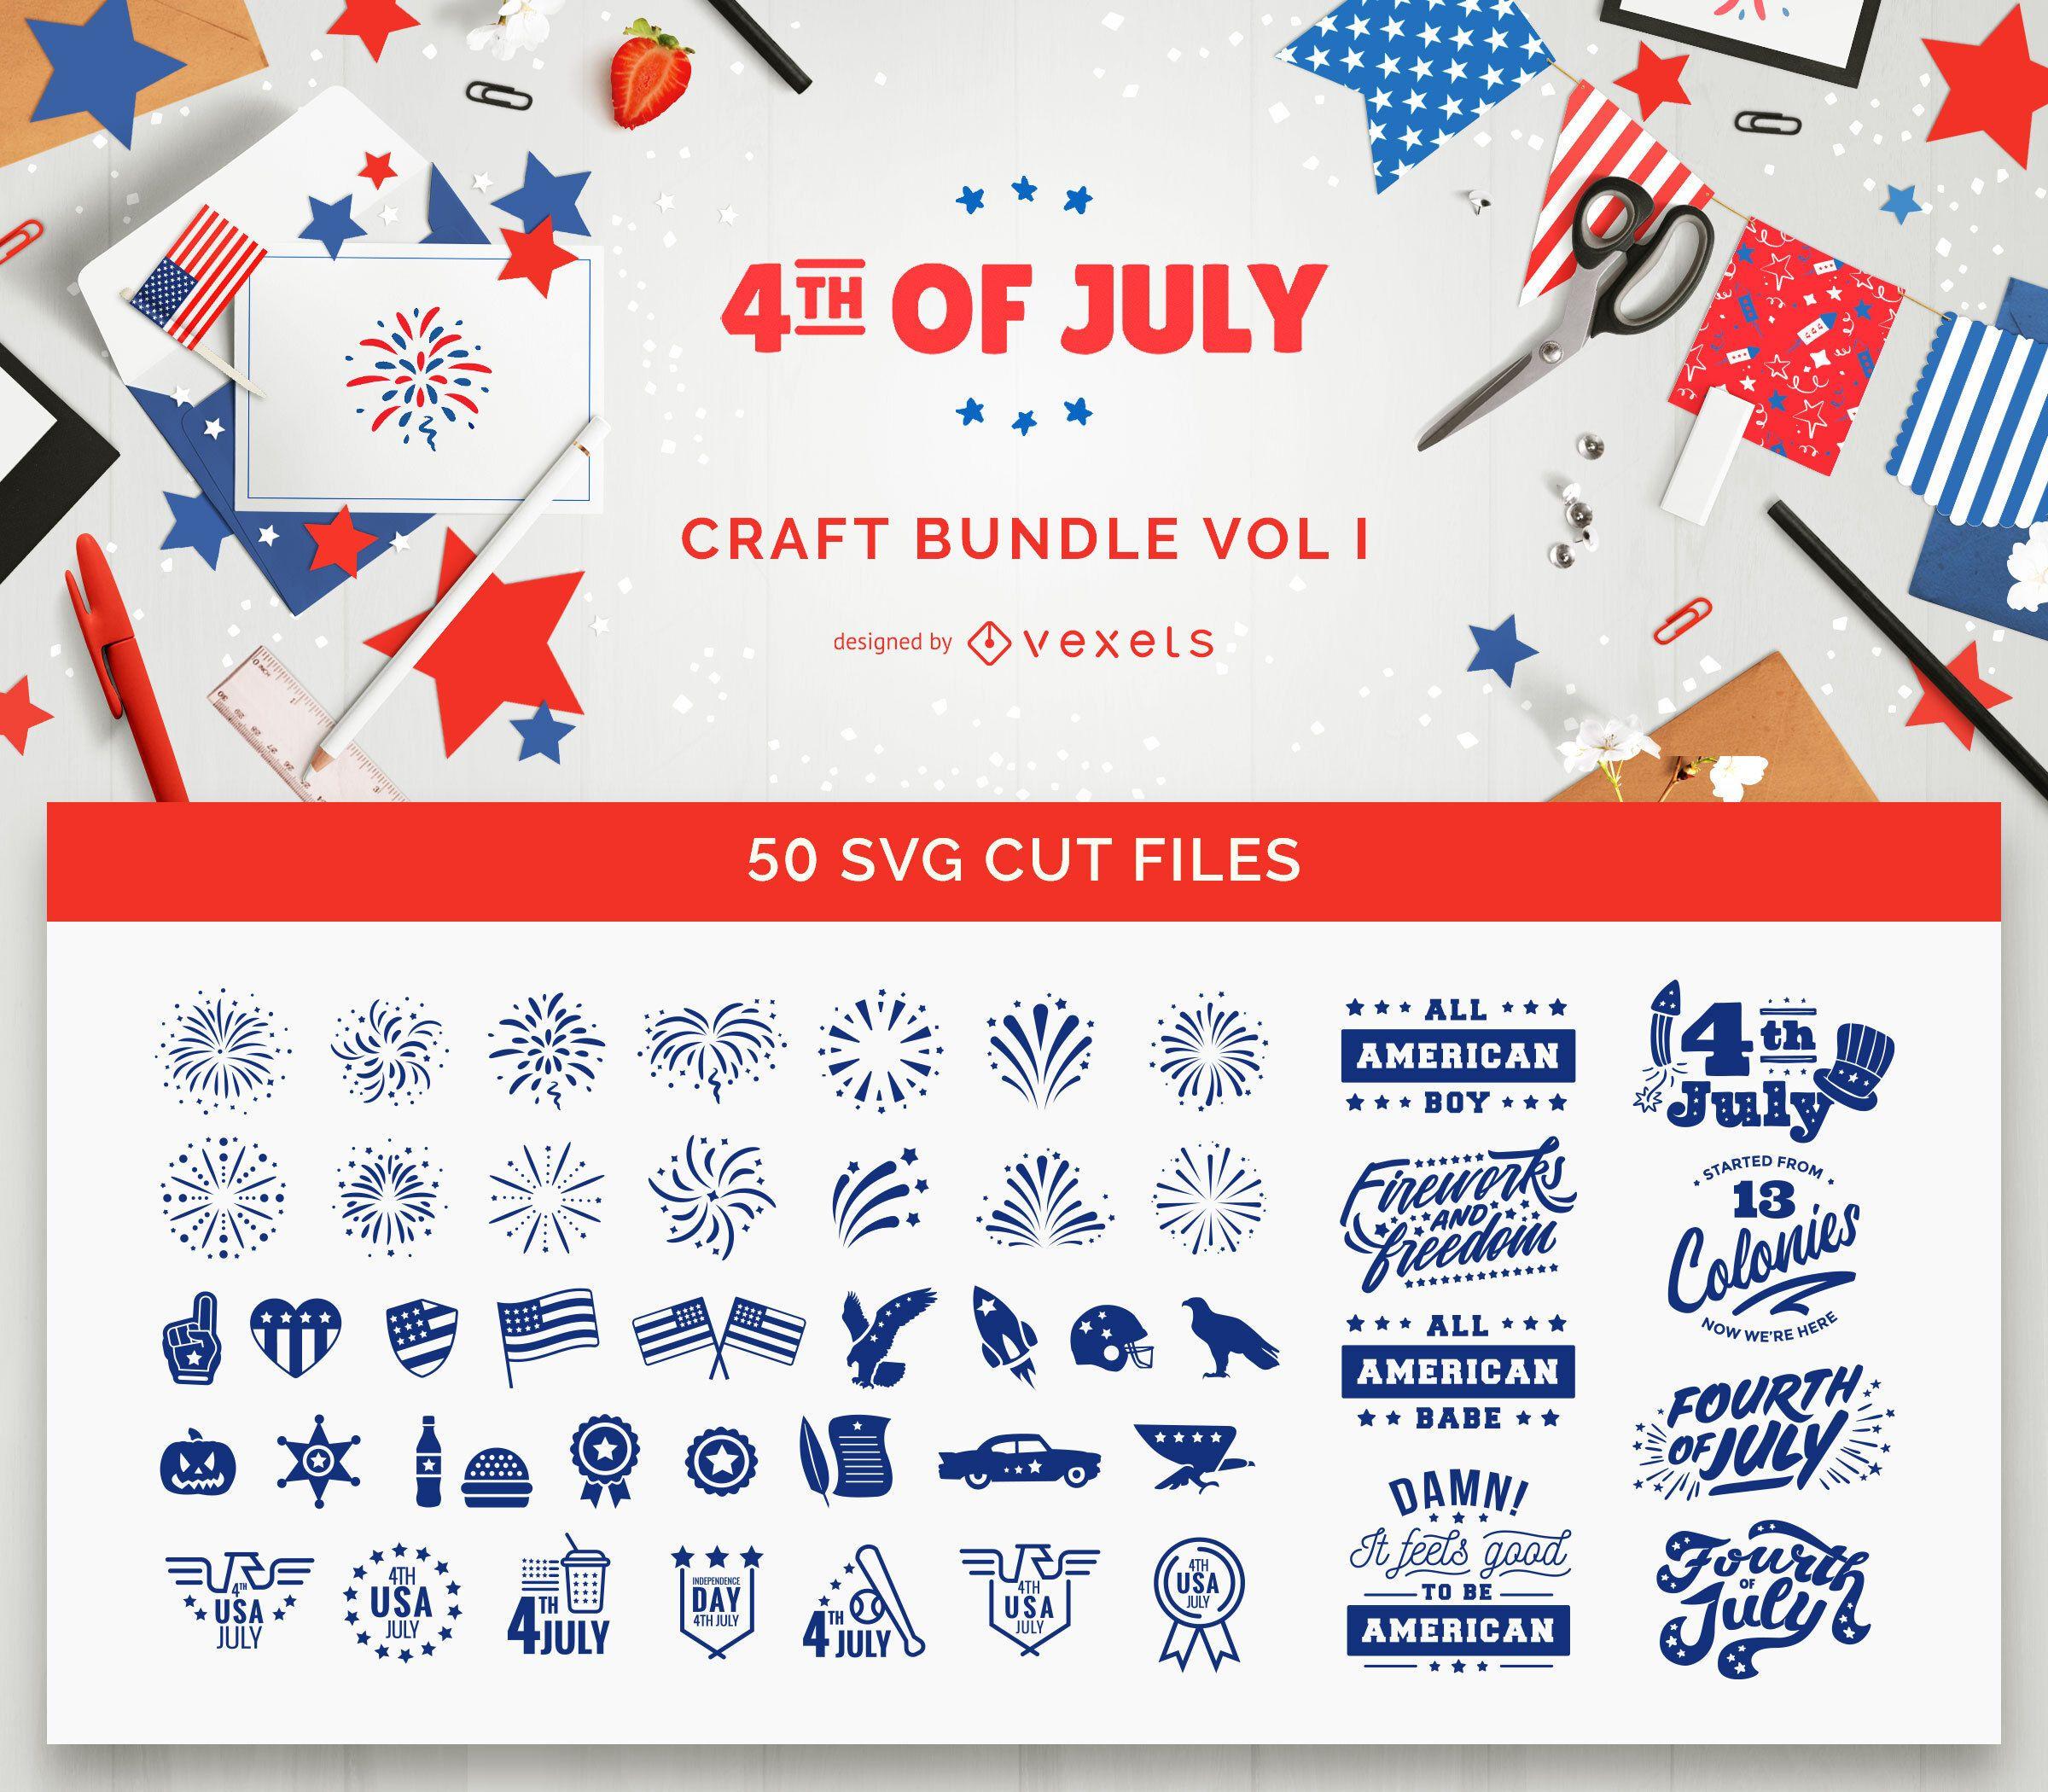 4th of July Craft Bundle Vol I